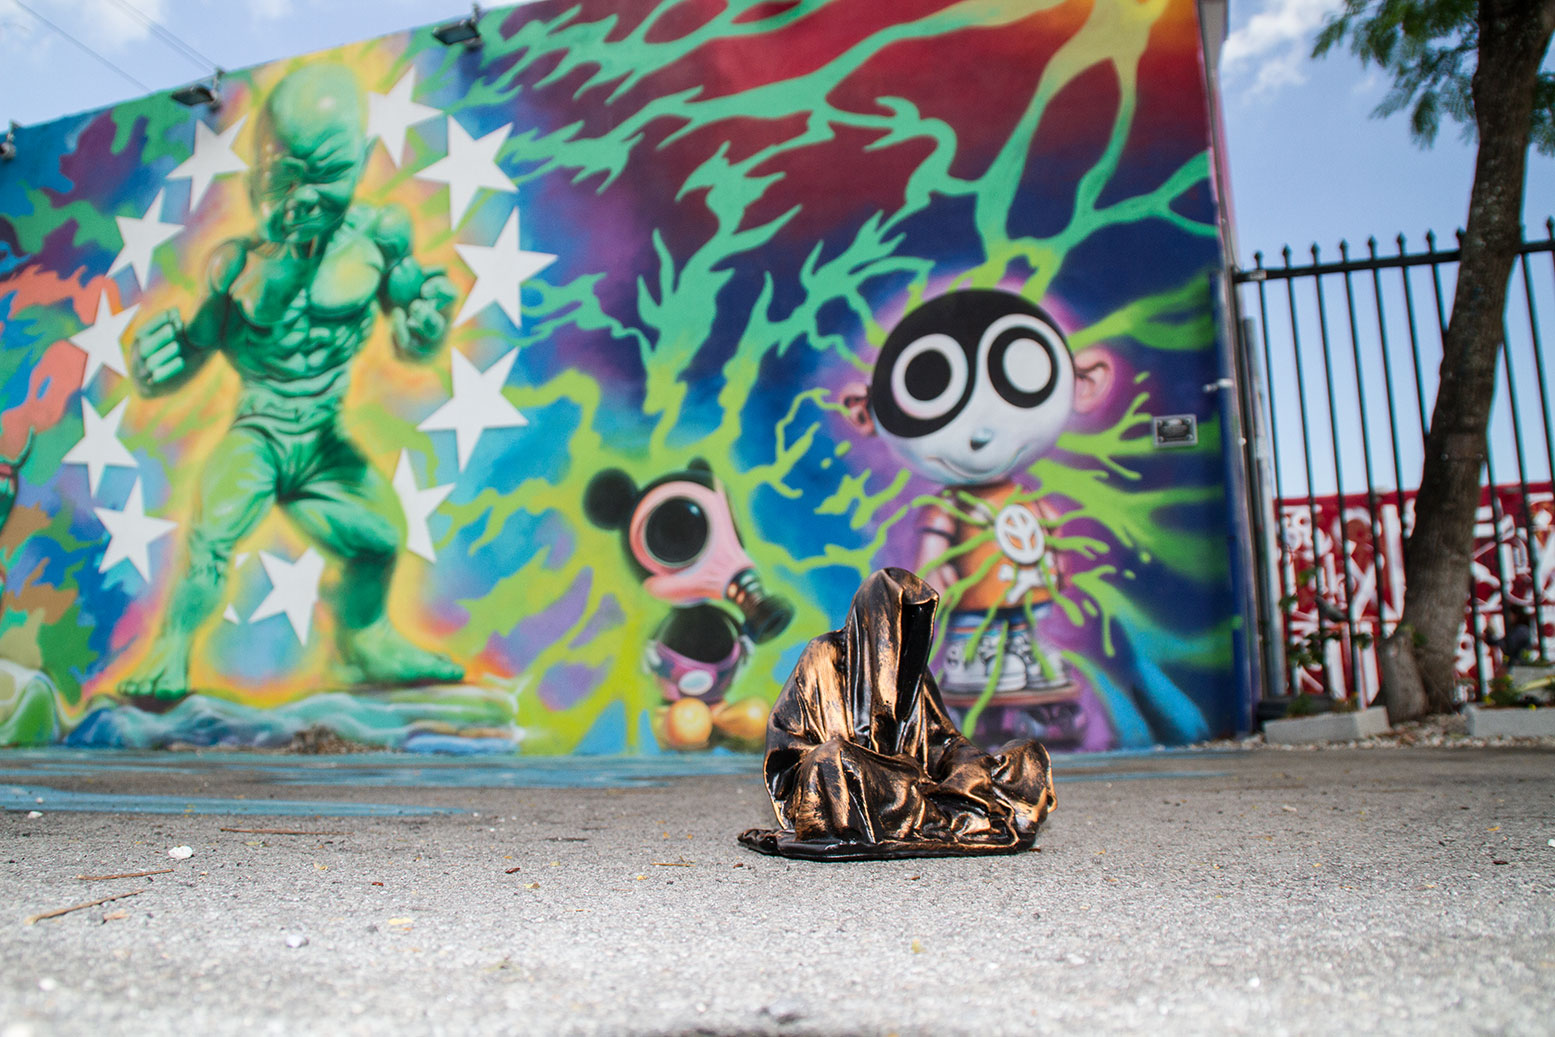 art-basel-miami-beach-fair-usa-florida-wynwood-guardians-of-time-manfred-kili-kielnhofer-contemporary-fine-art-modern-arts-design-antiques-sculpture-spectrum-miami-7578